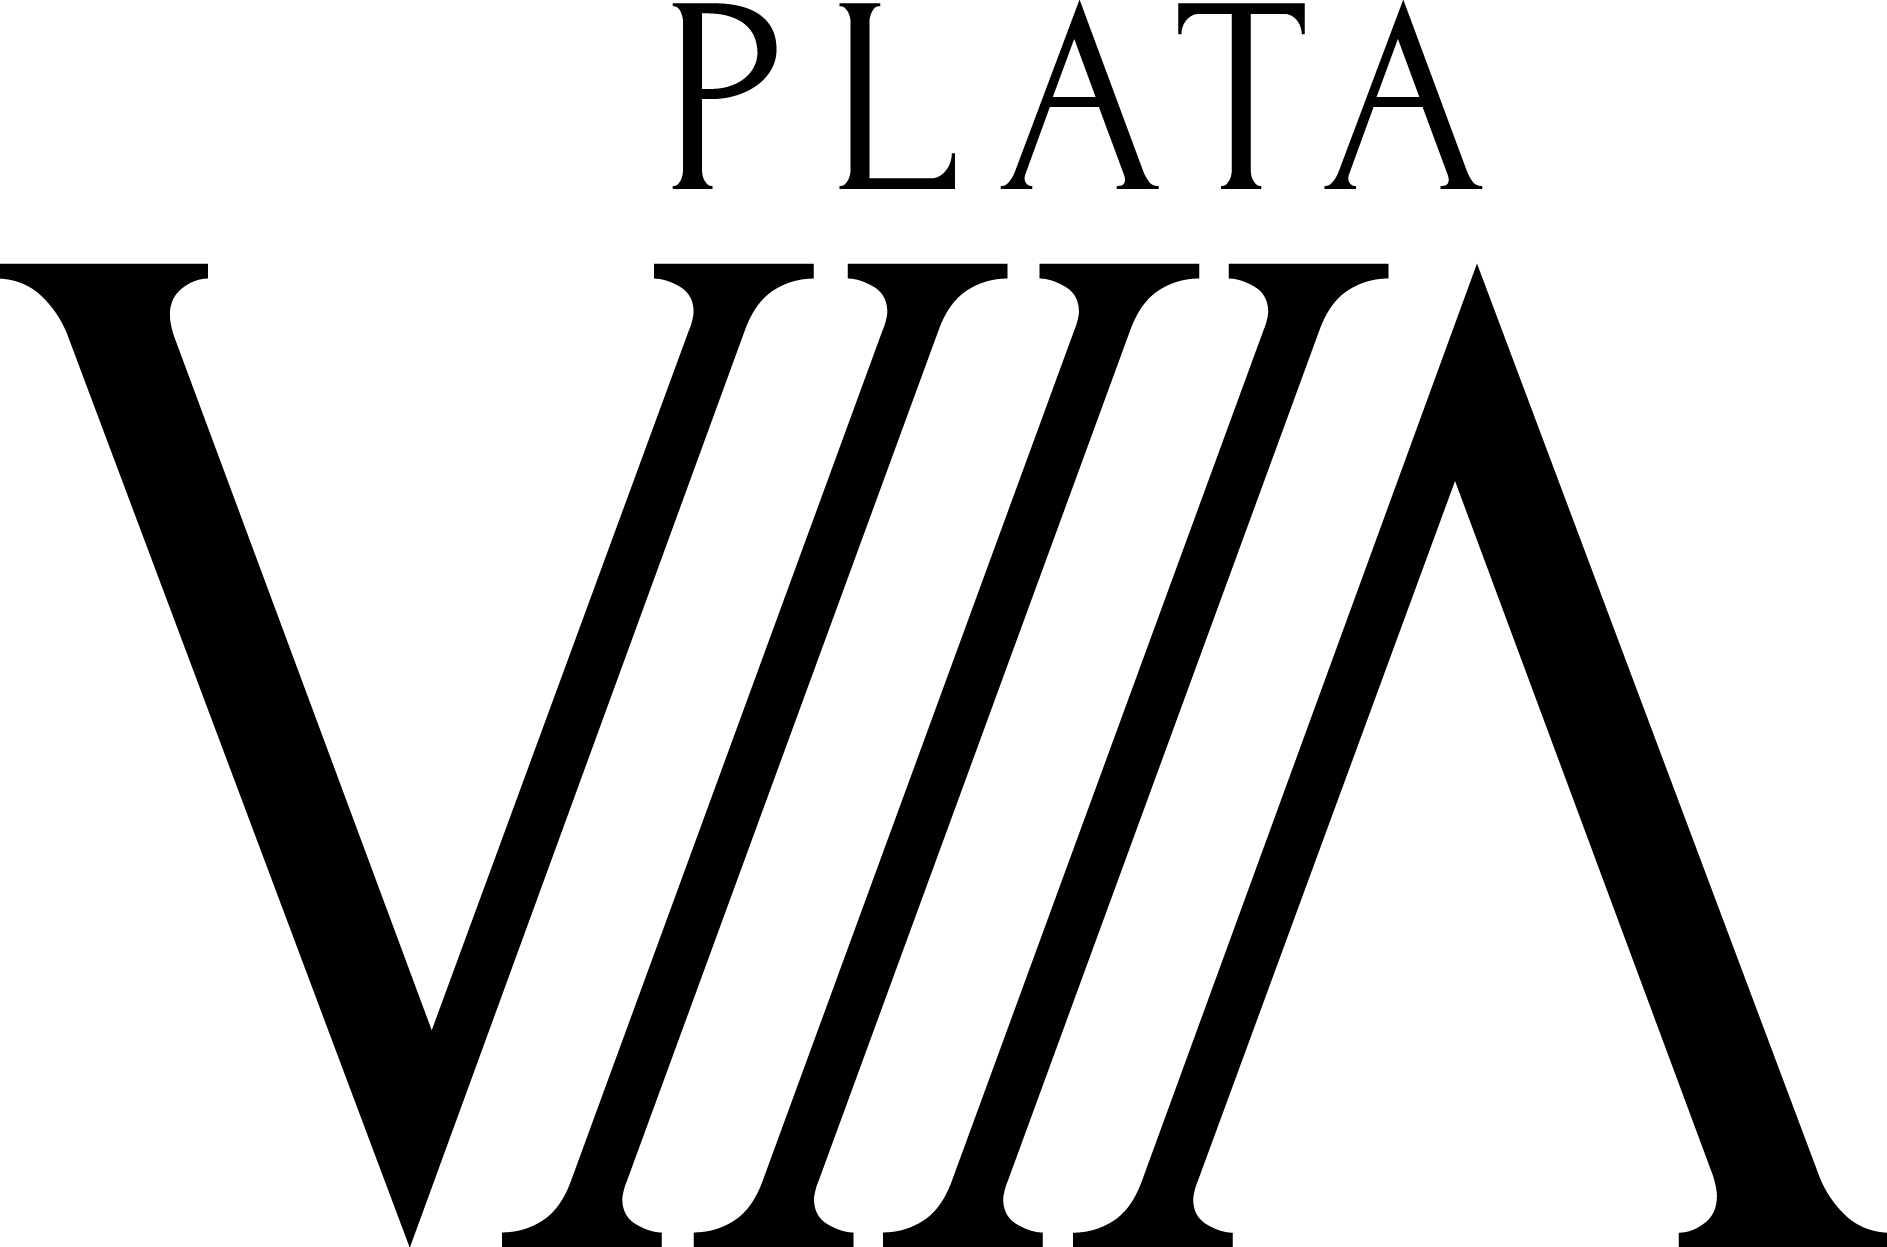 Platavilla